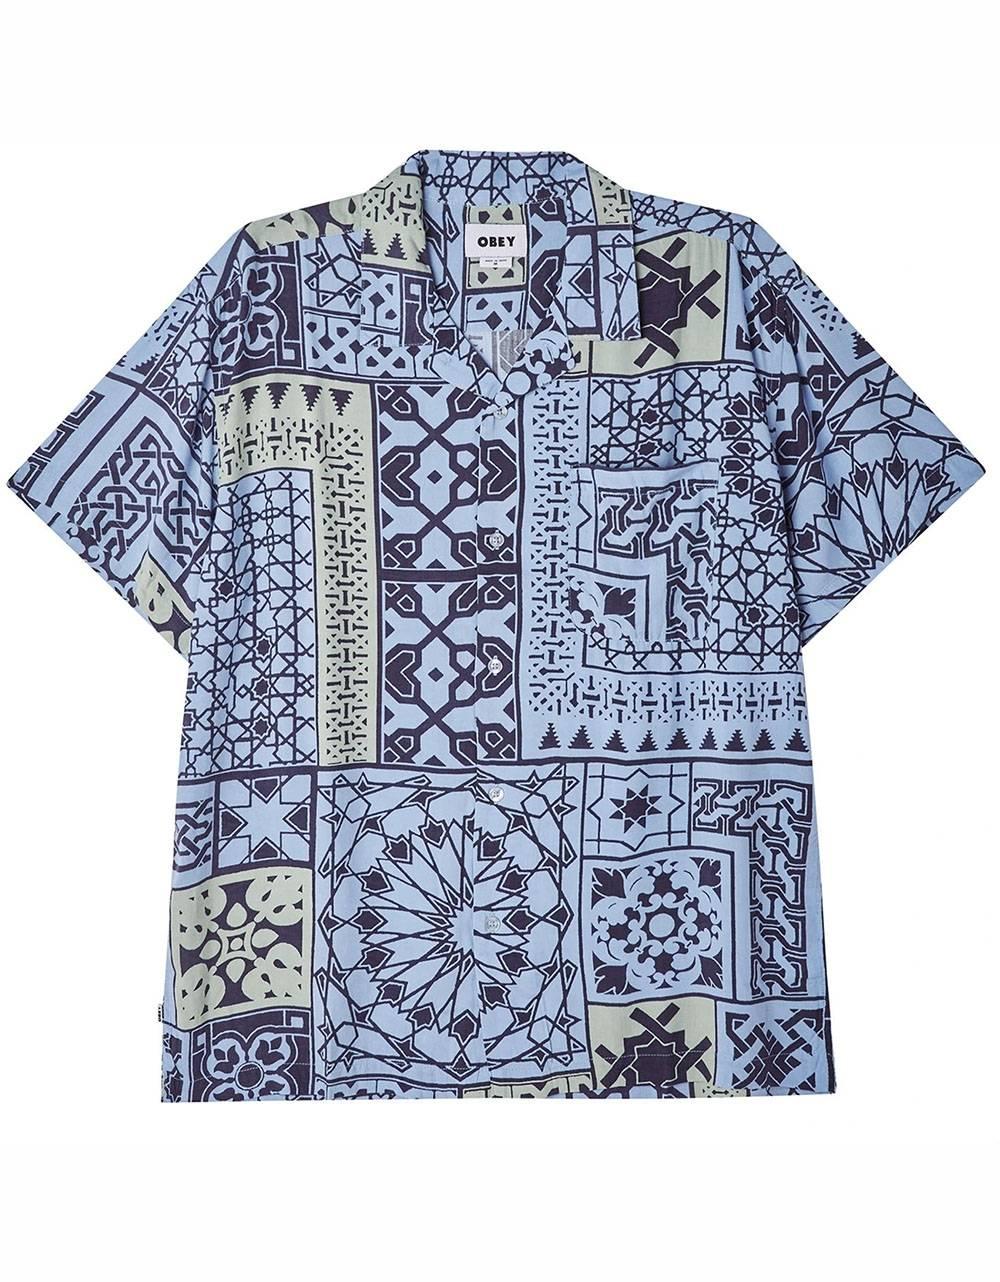 Obey Pathos shirt - navy multi obey Shirt 69,67€